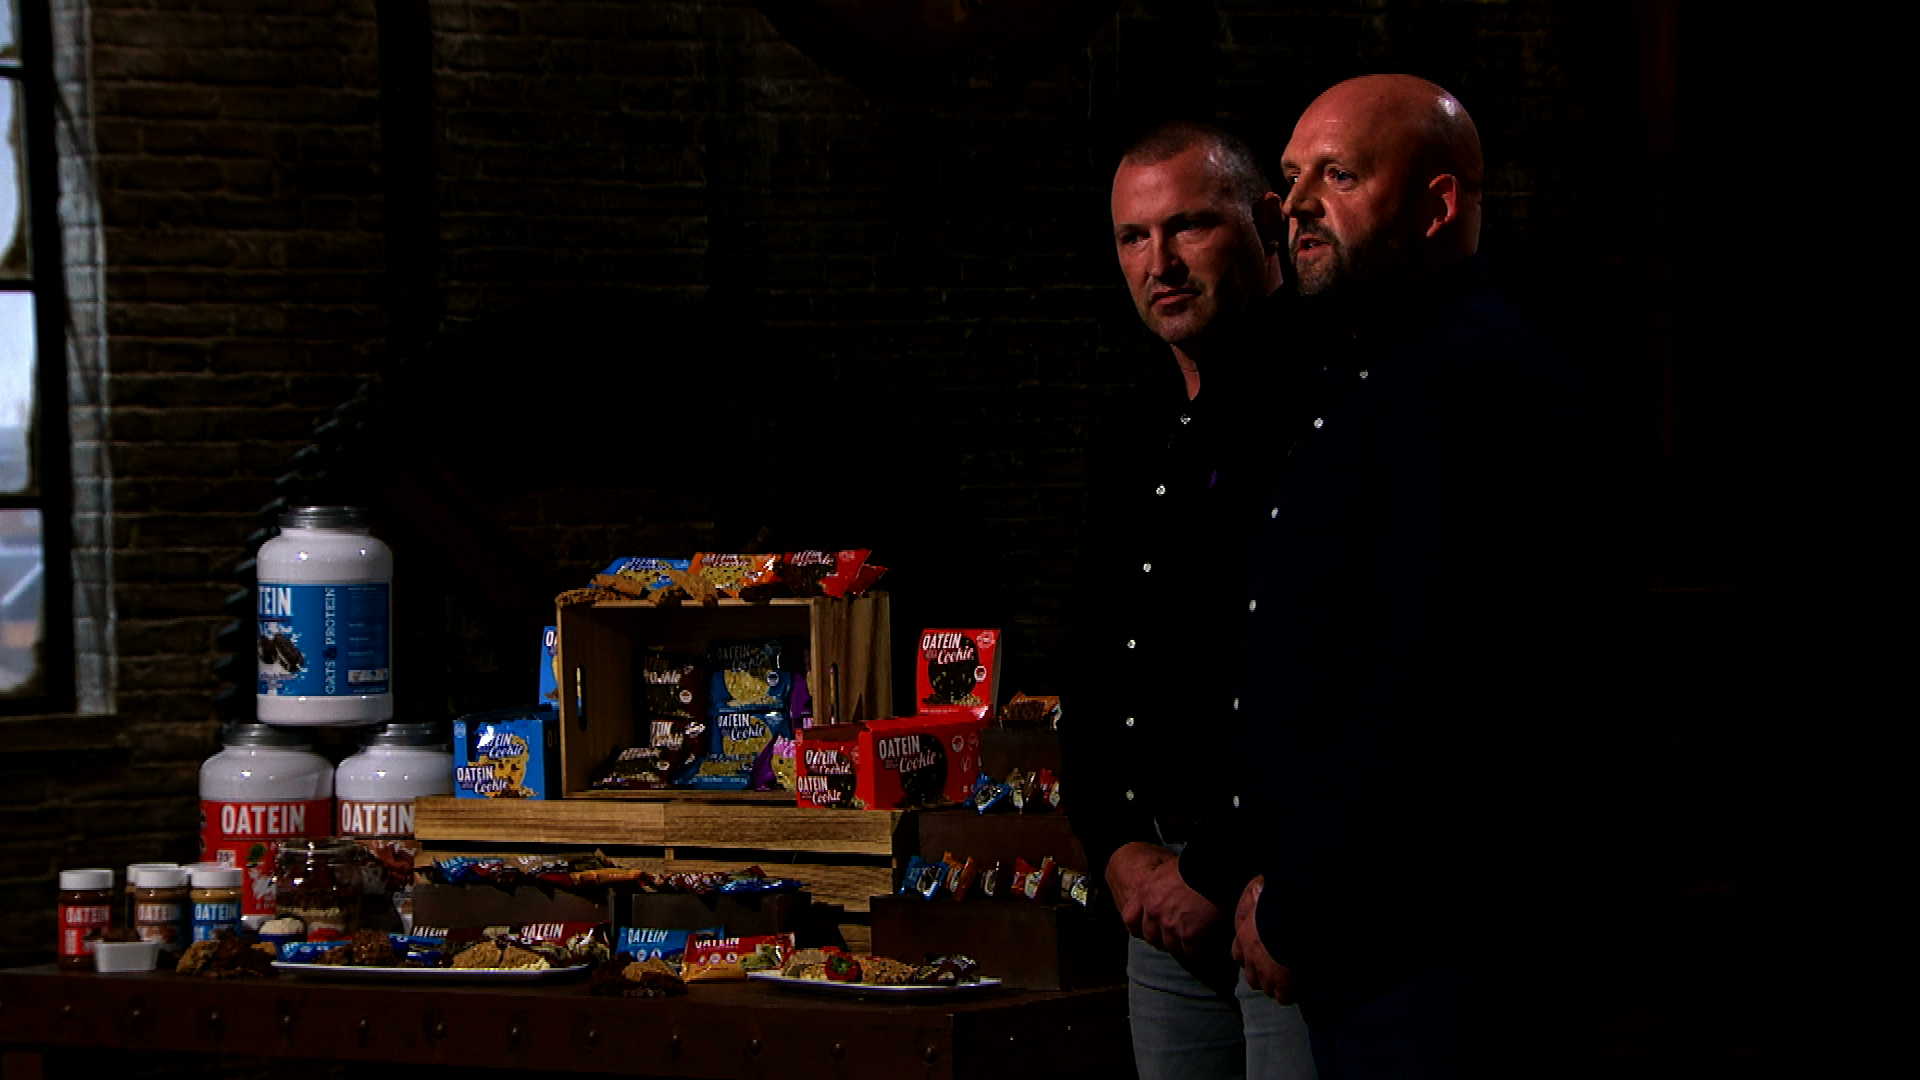 dragons den uk season 14 watch online